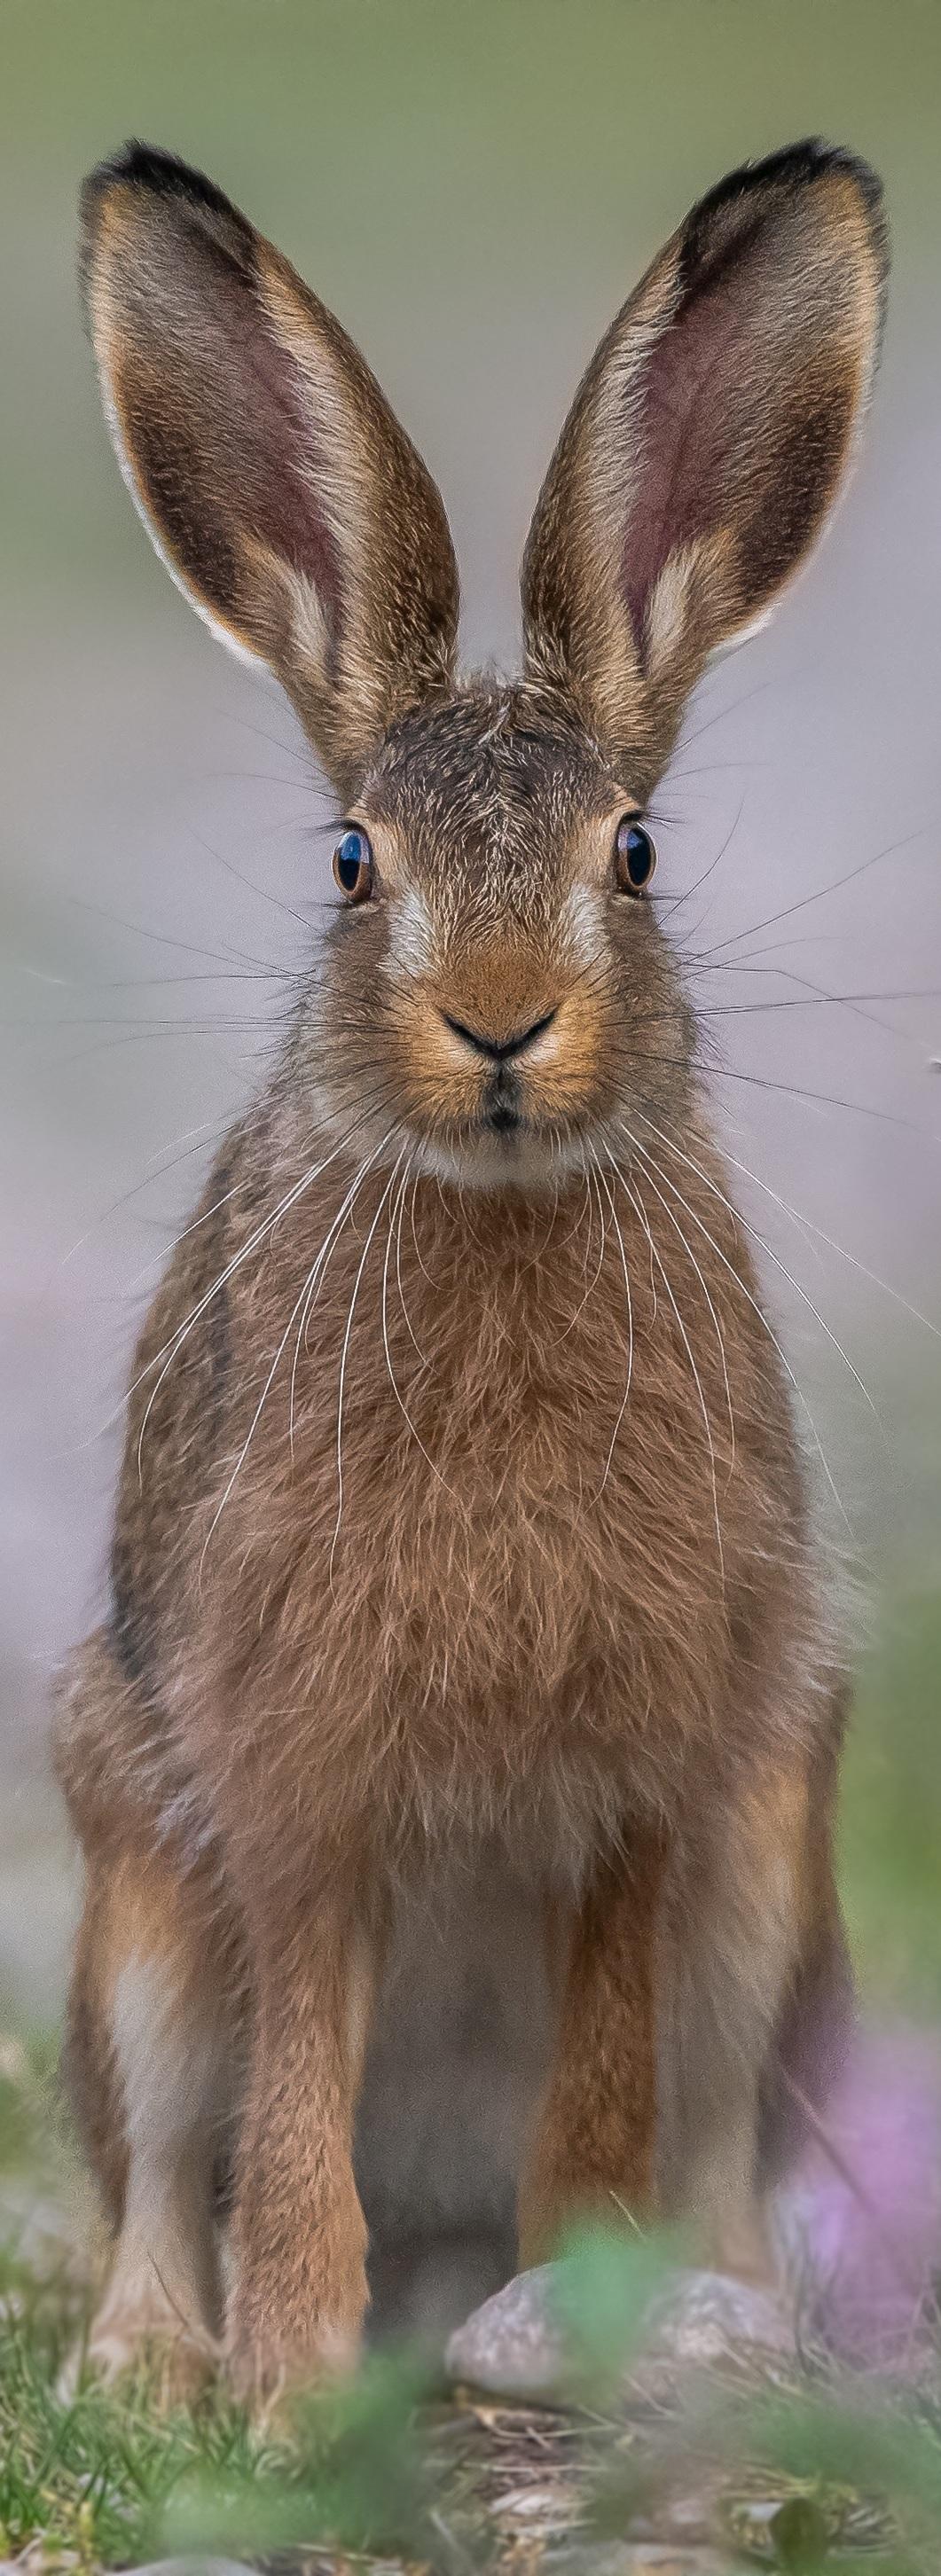 Hare all ears.